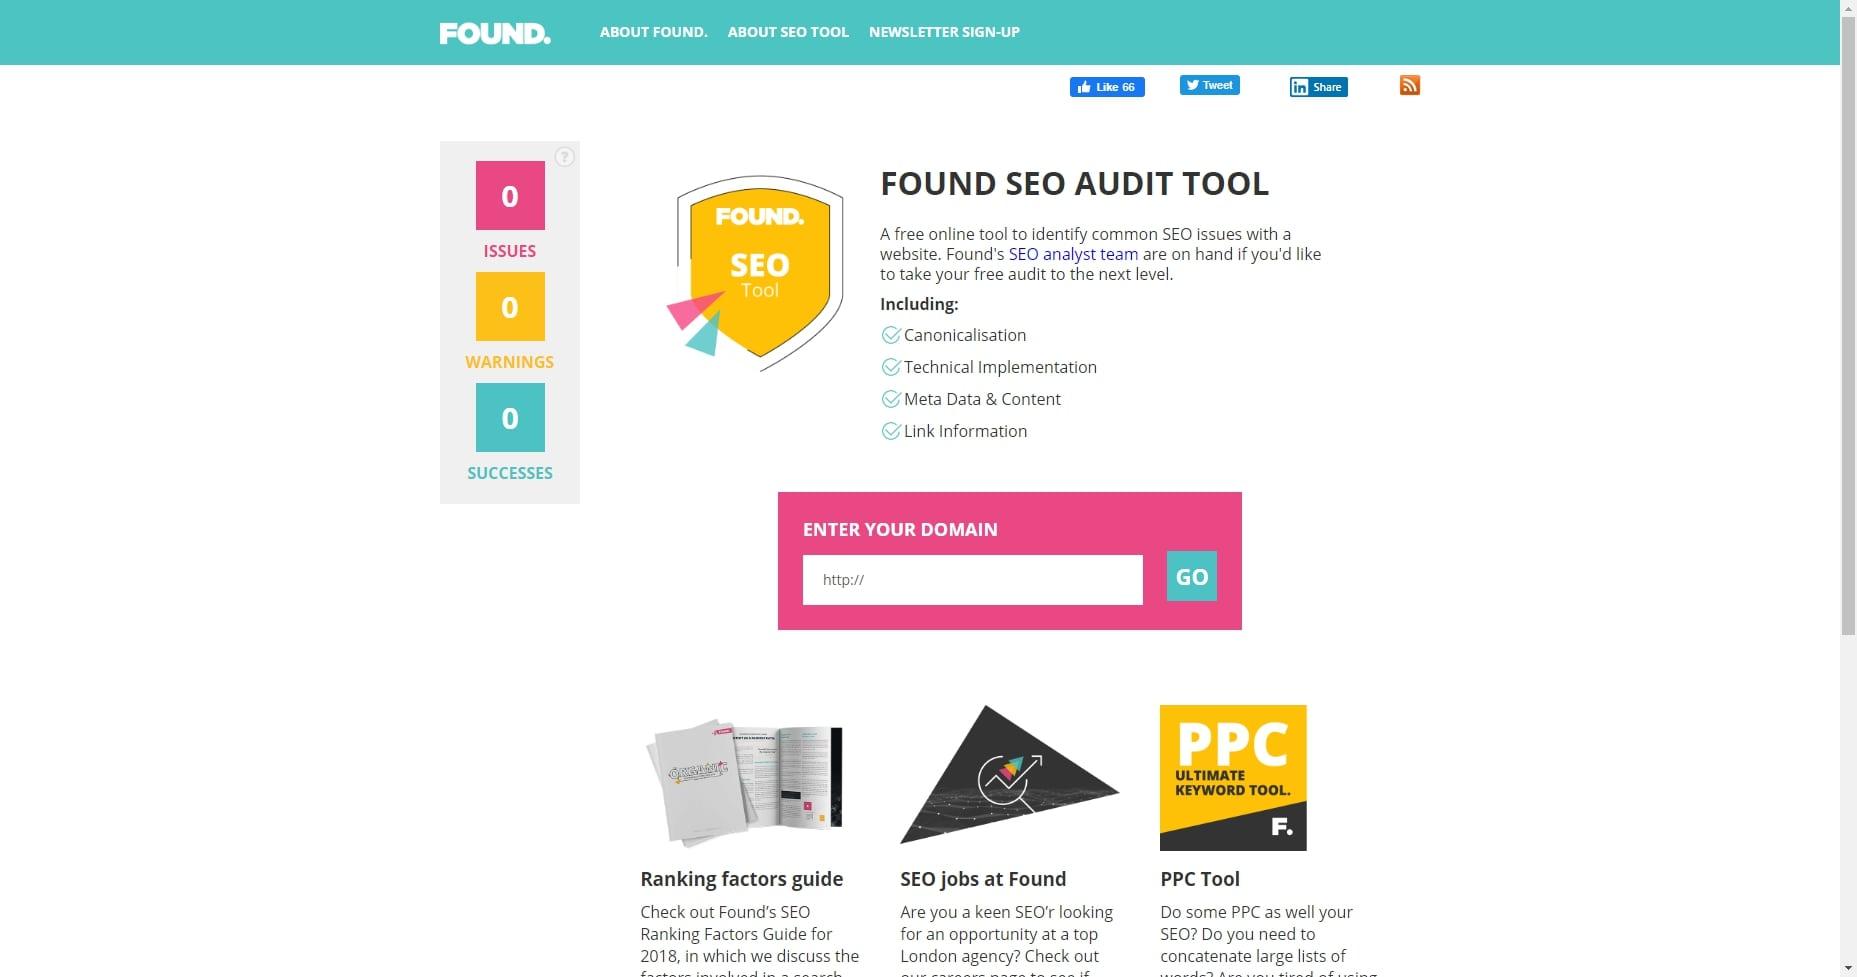 Found SEO Audit Tool